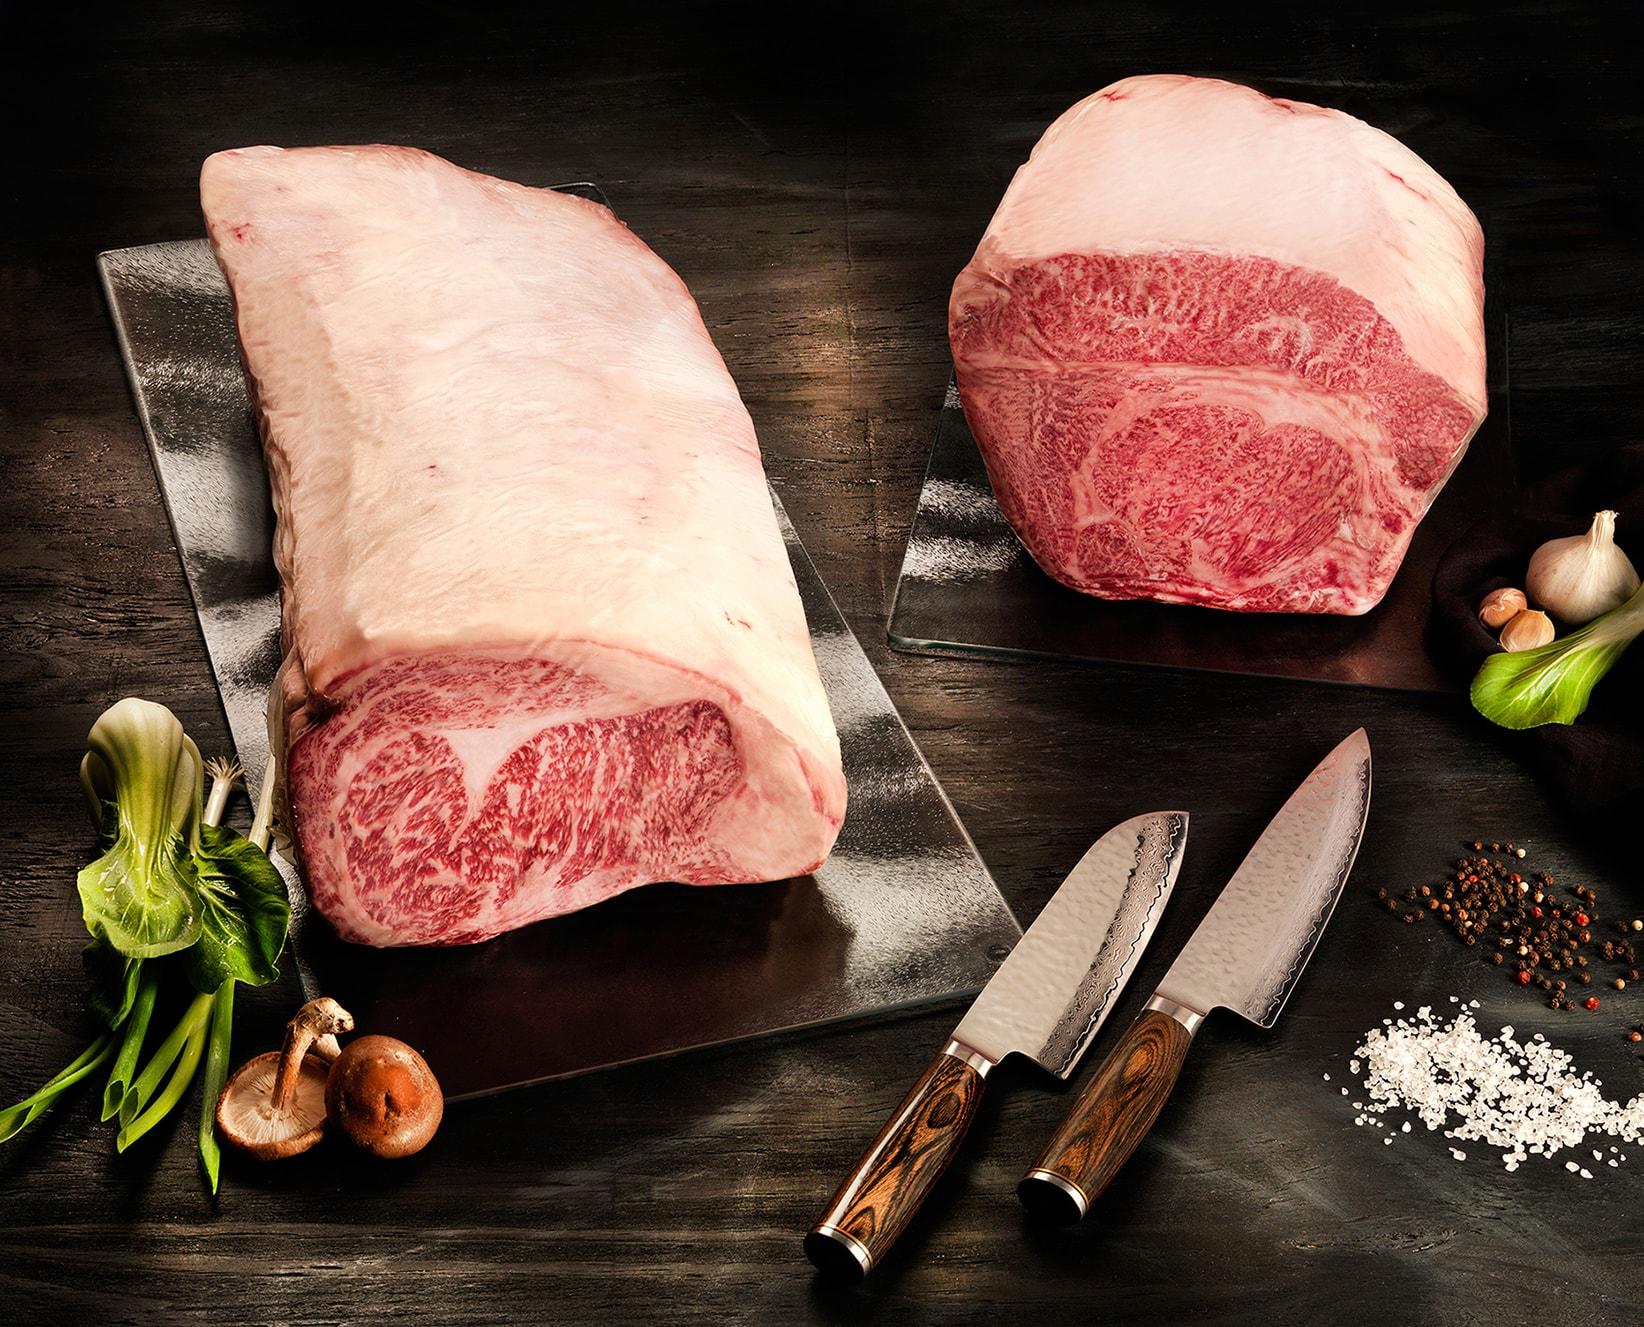 meatshop-food-photography-miami-marcel-boldu.jpg